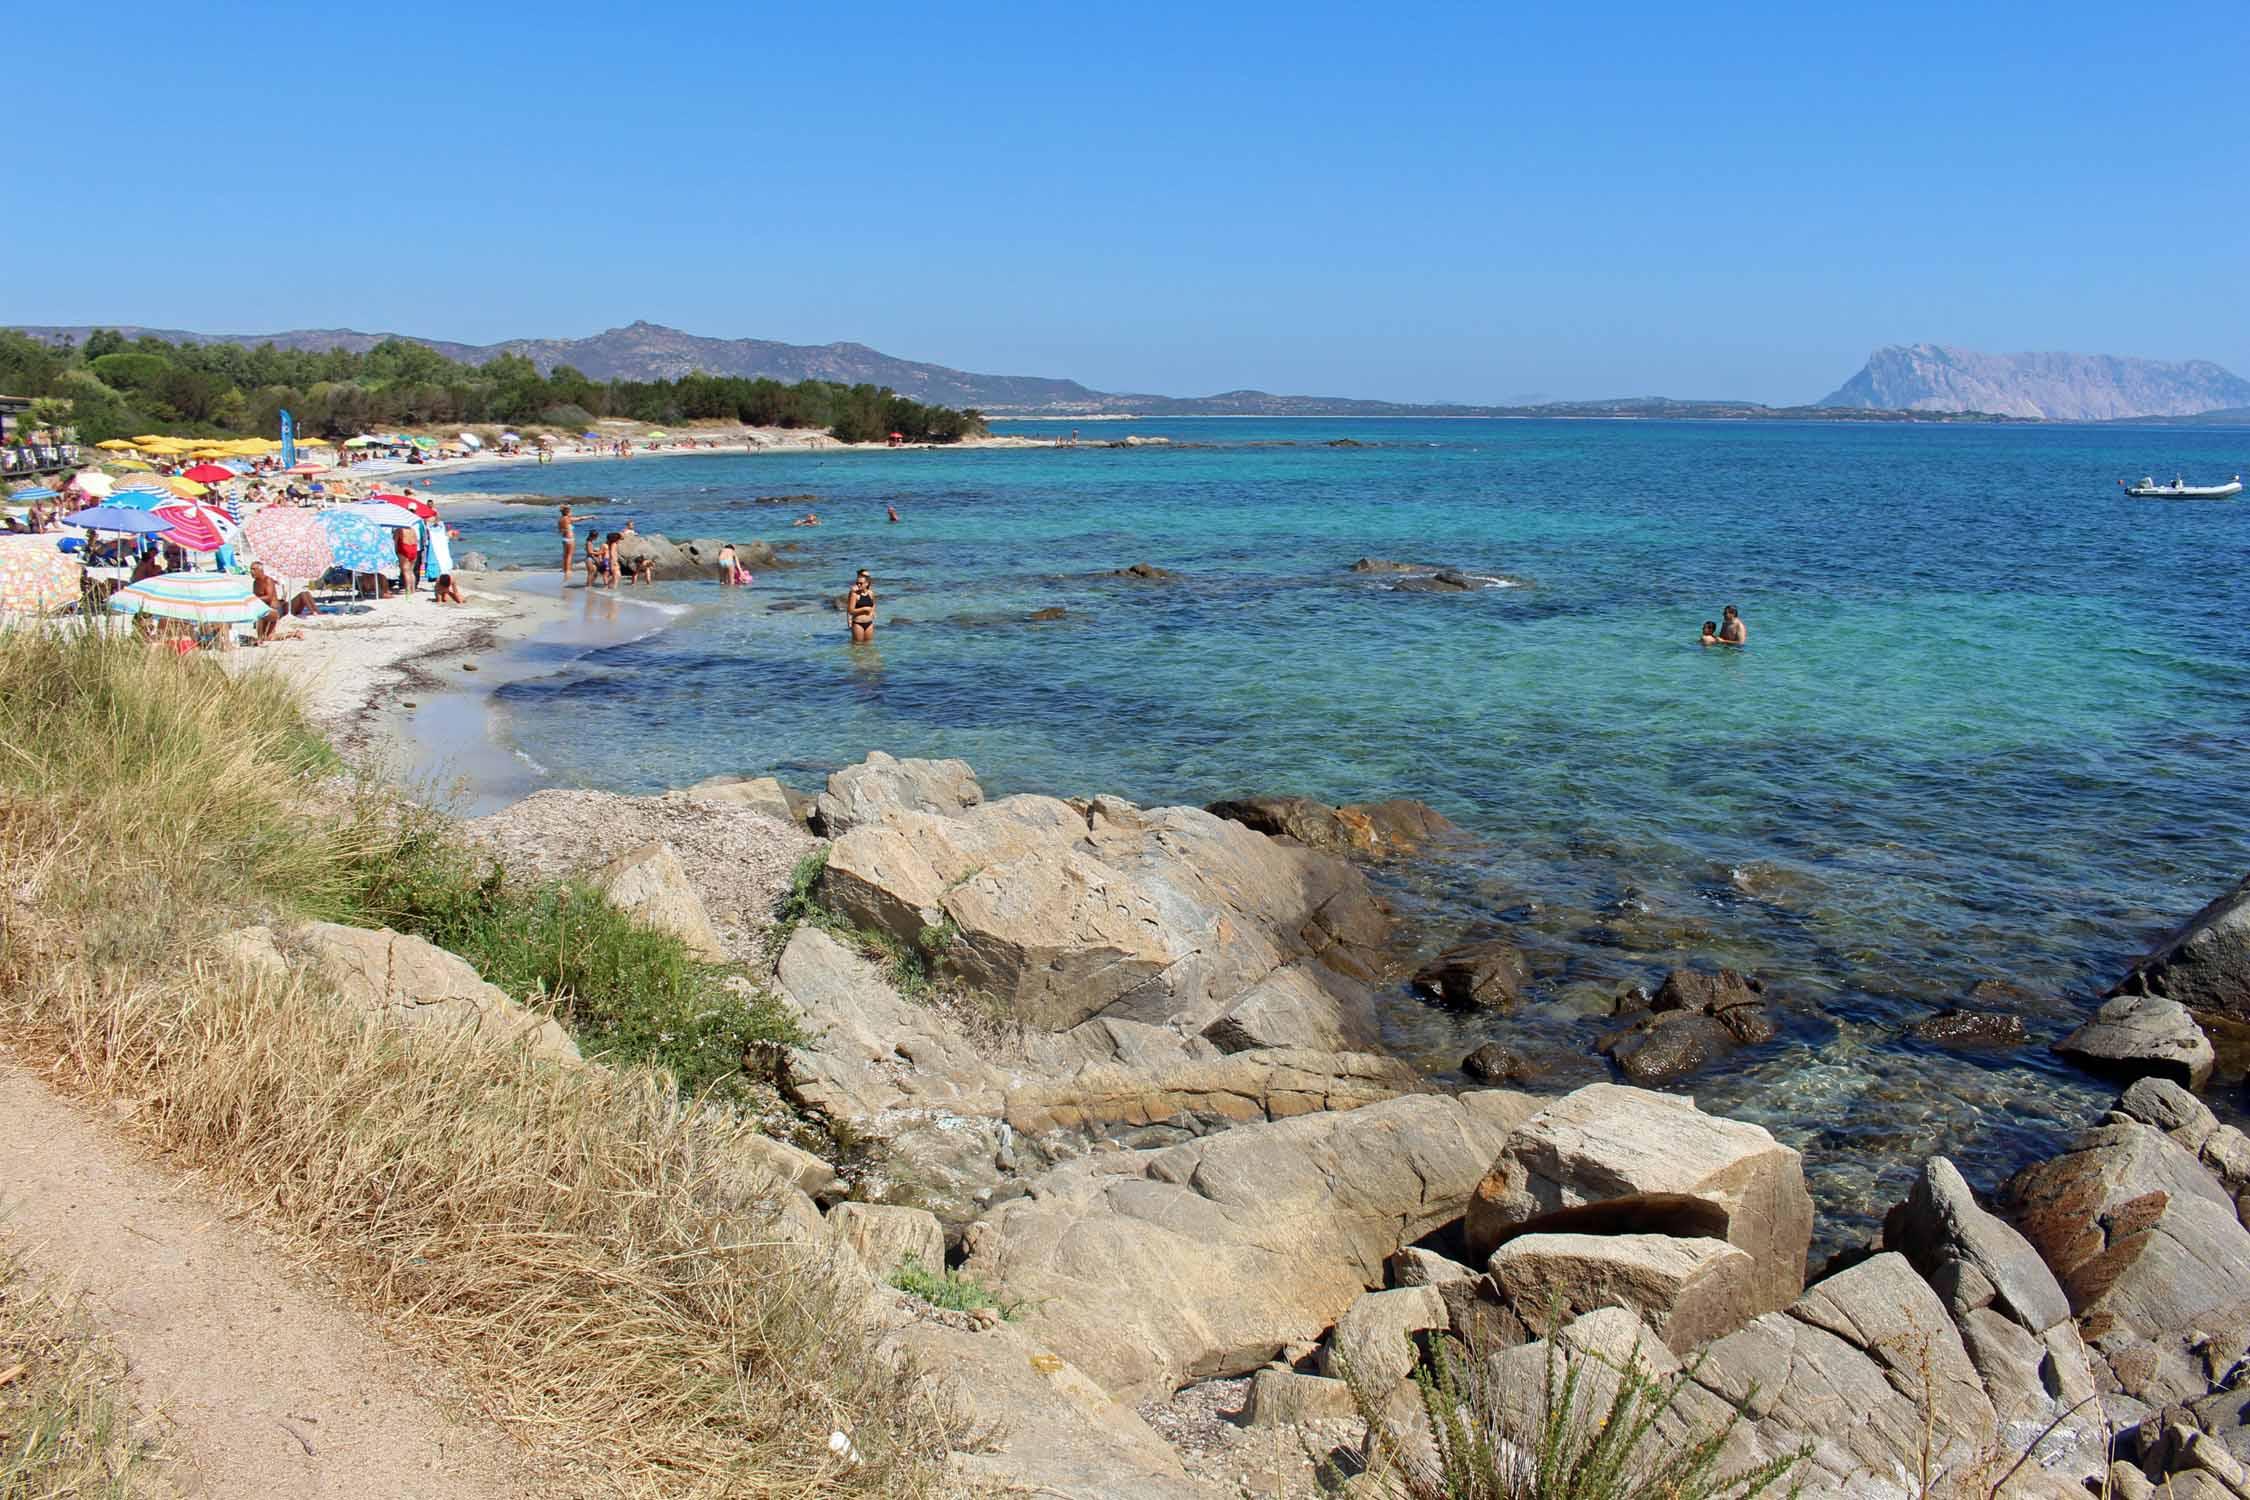 Playa Cala d'Ambra